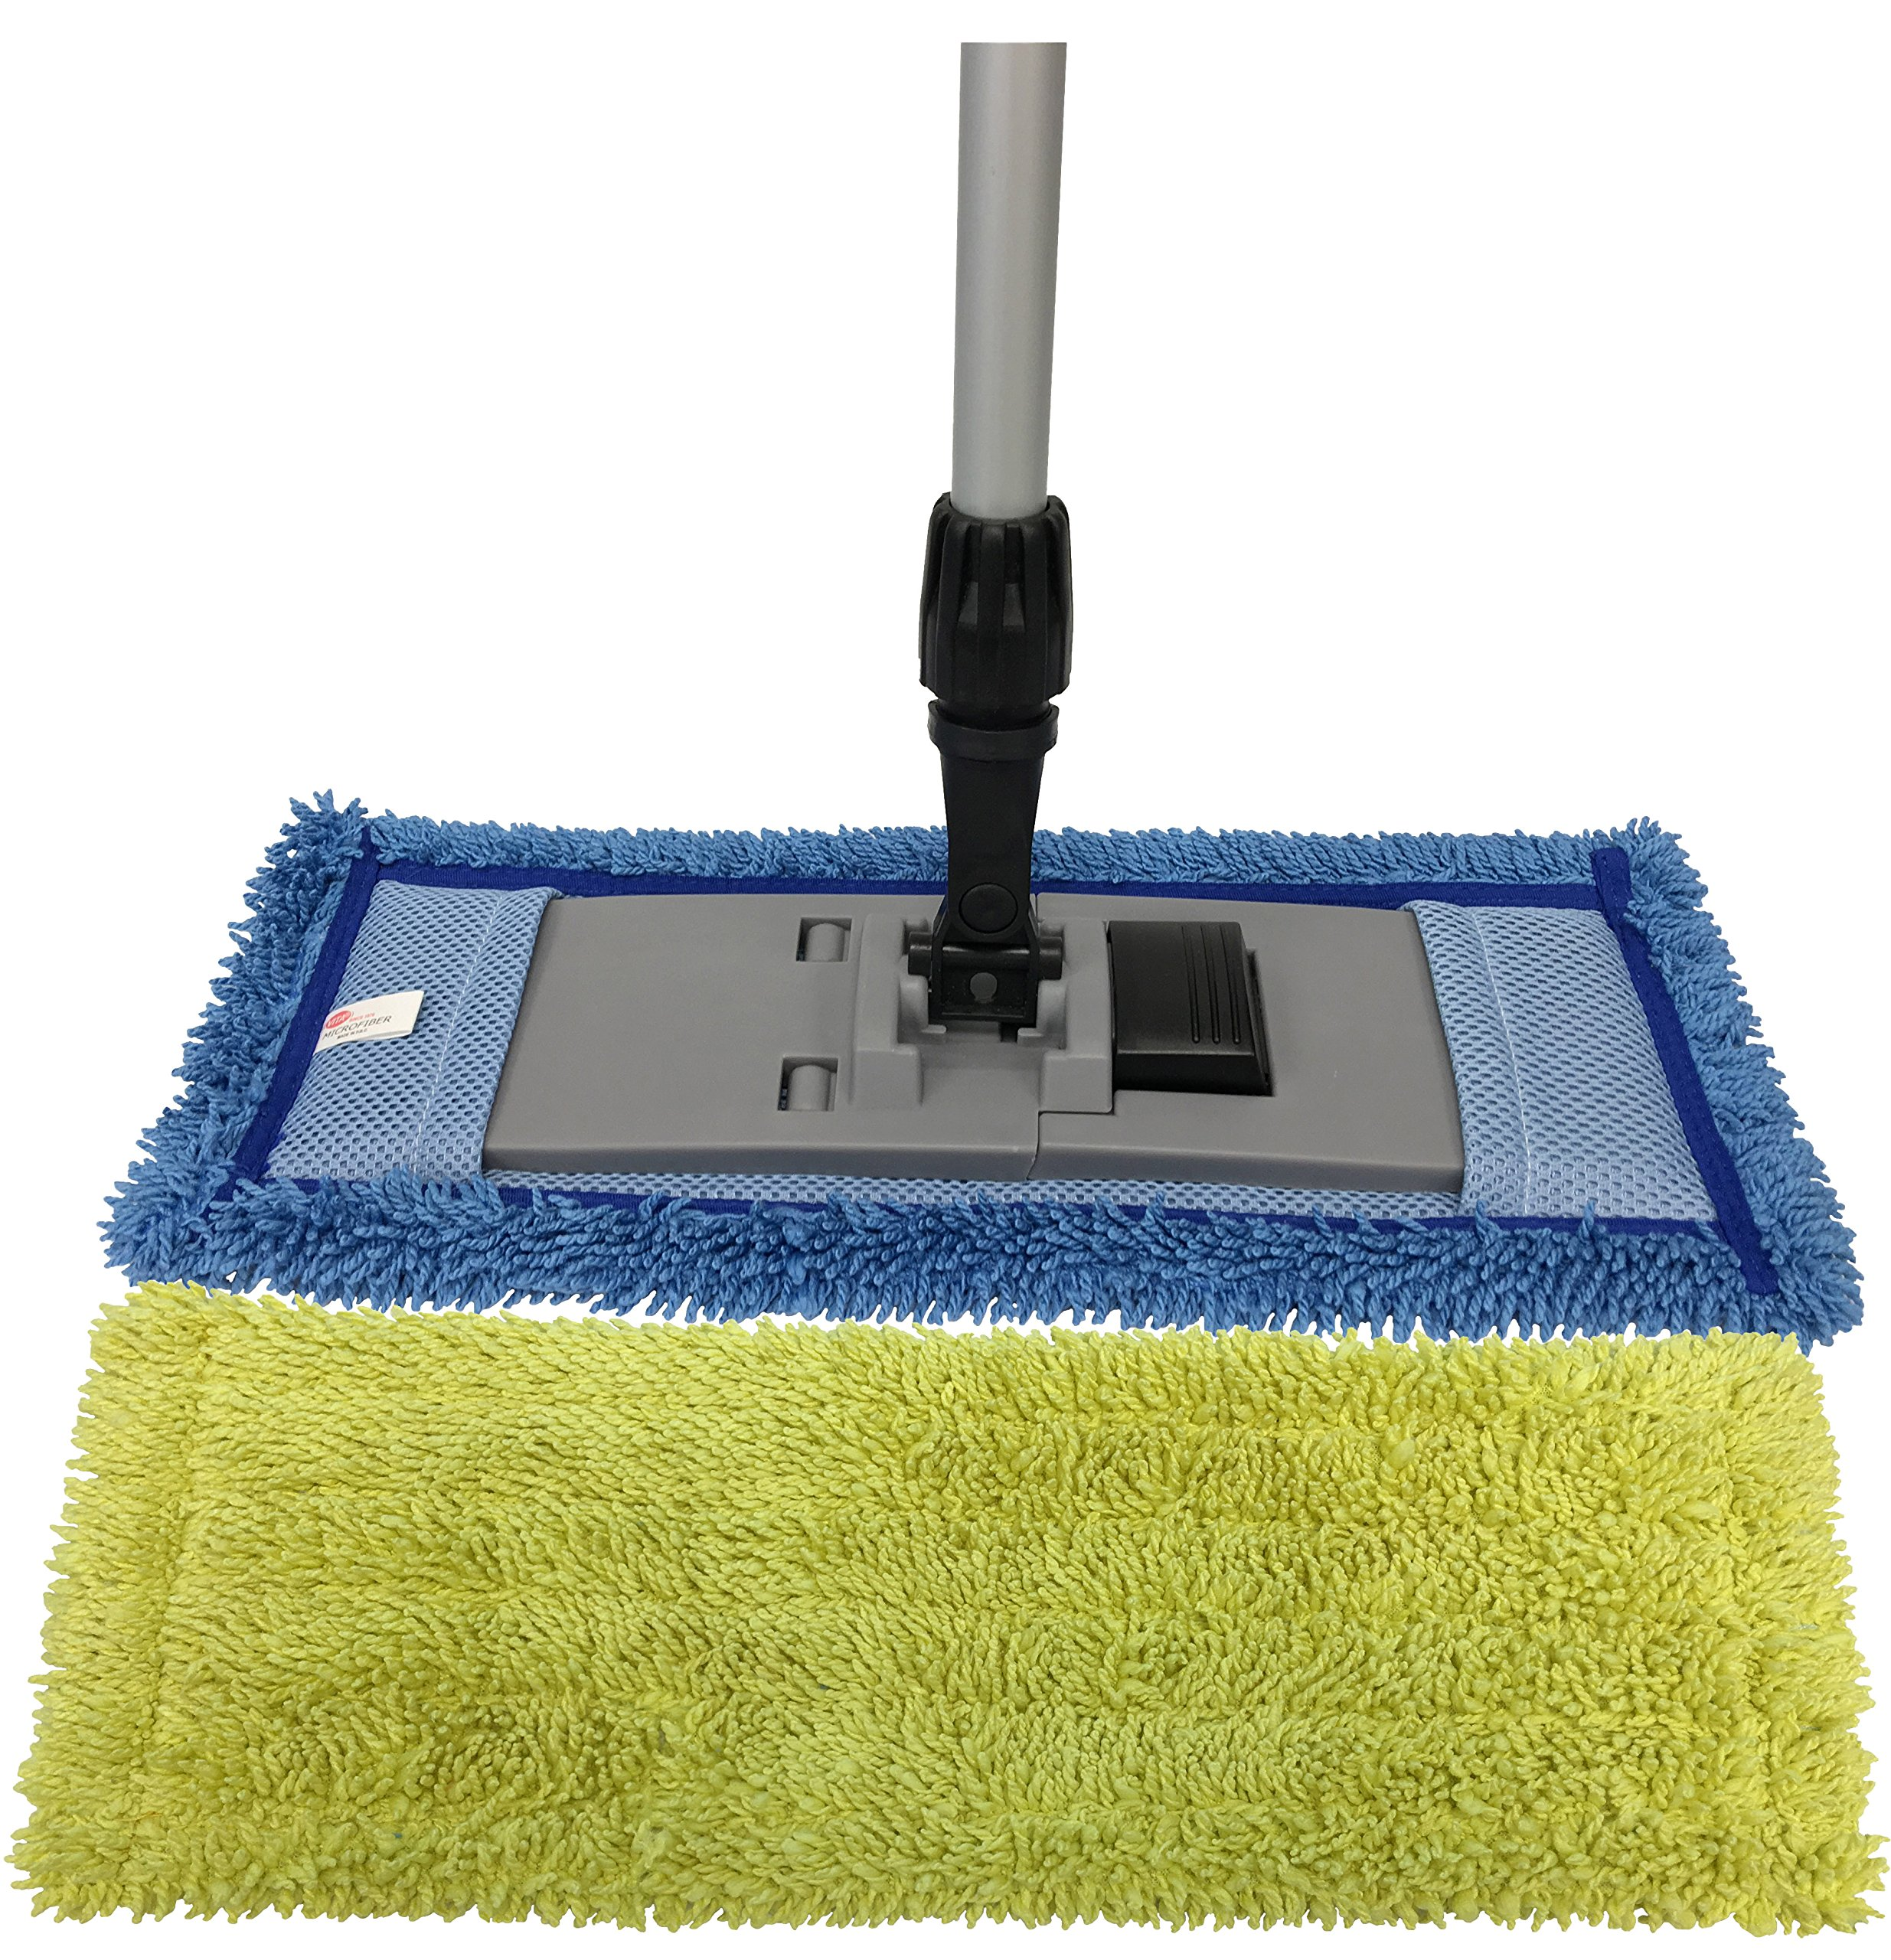 Microfiber Pocket Mop Kit: 1) Blue 18'' Pocket Mop, 1) Yellow 18'' Pocket Mop, 1) 72'' Aluminum Extension Handle & 1) 16'' Pocket Mop Frame